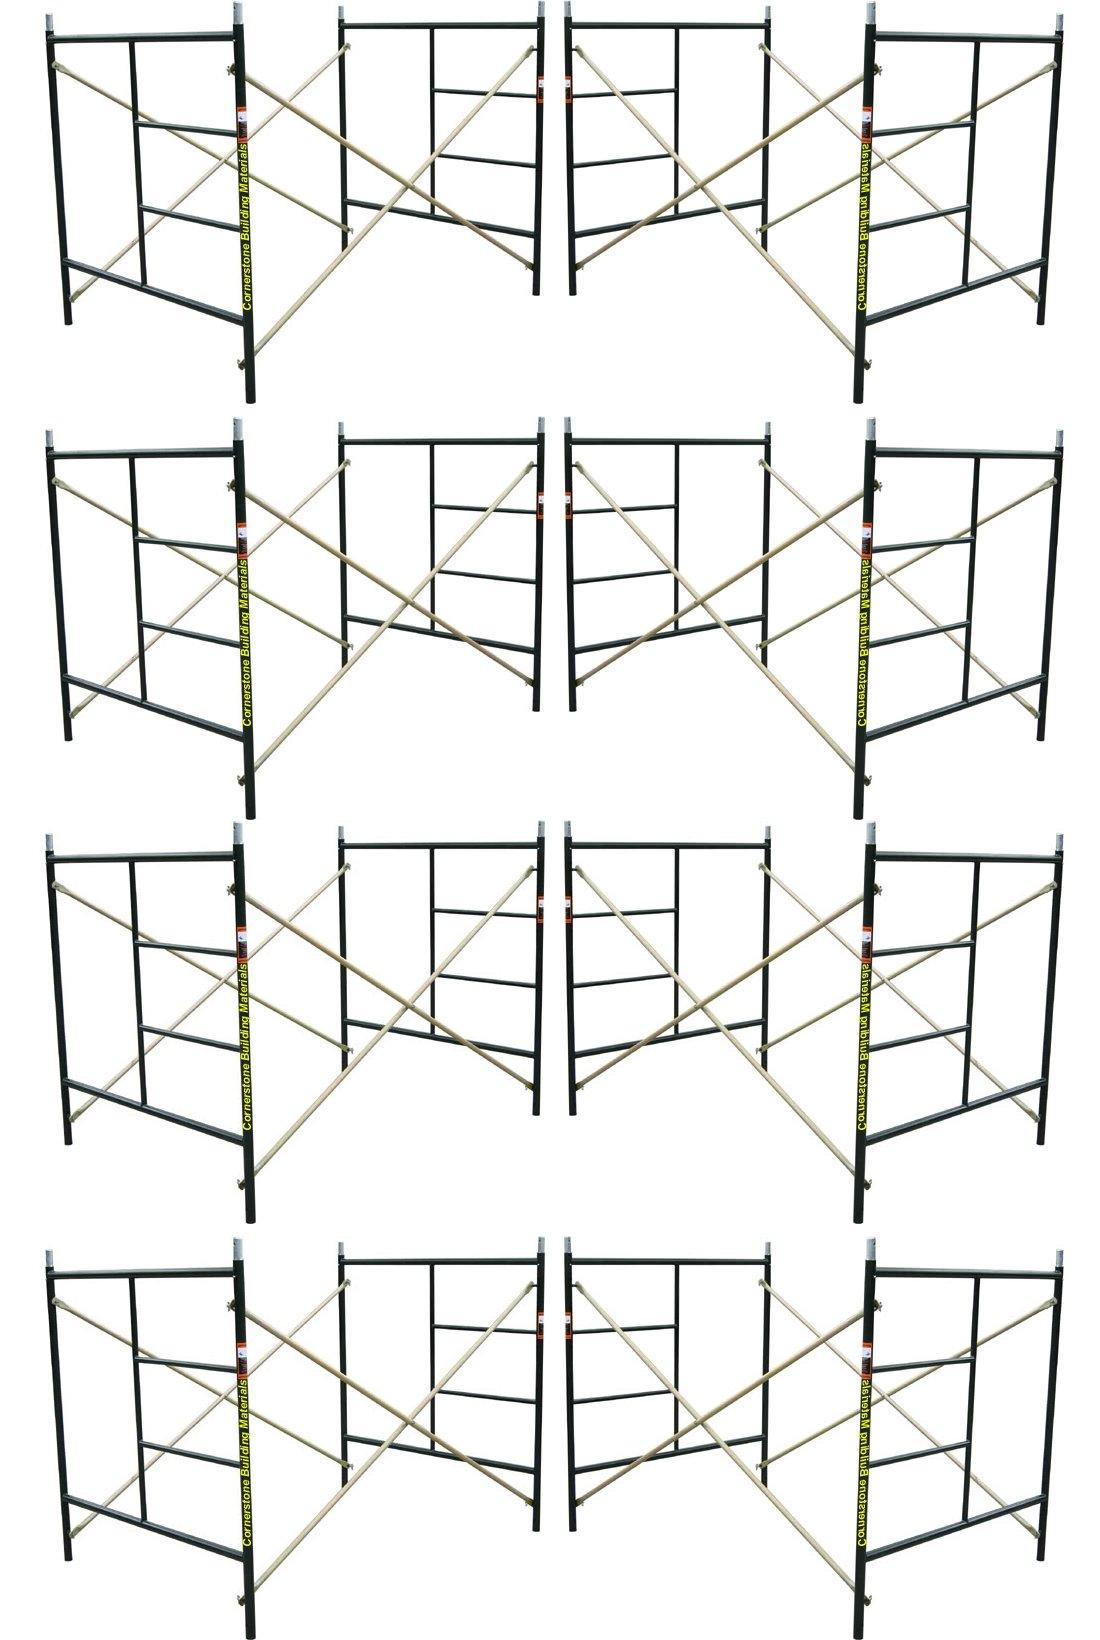 Eight Set New Flip Lock 5' X 5'1'' X 7' Masonry Scaffolding Frame Sets CBMSCAFFOLD